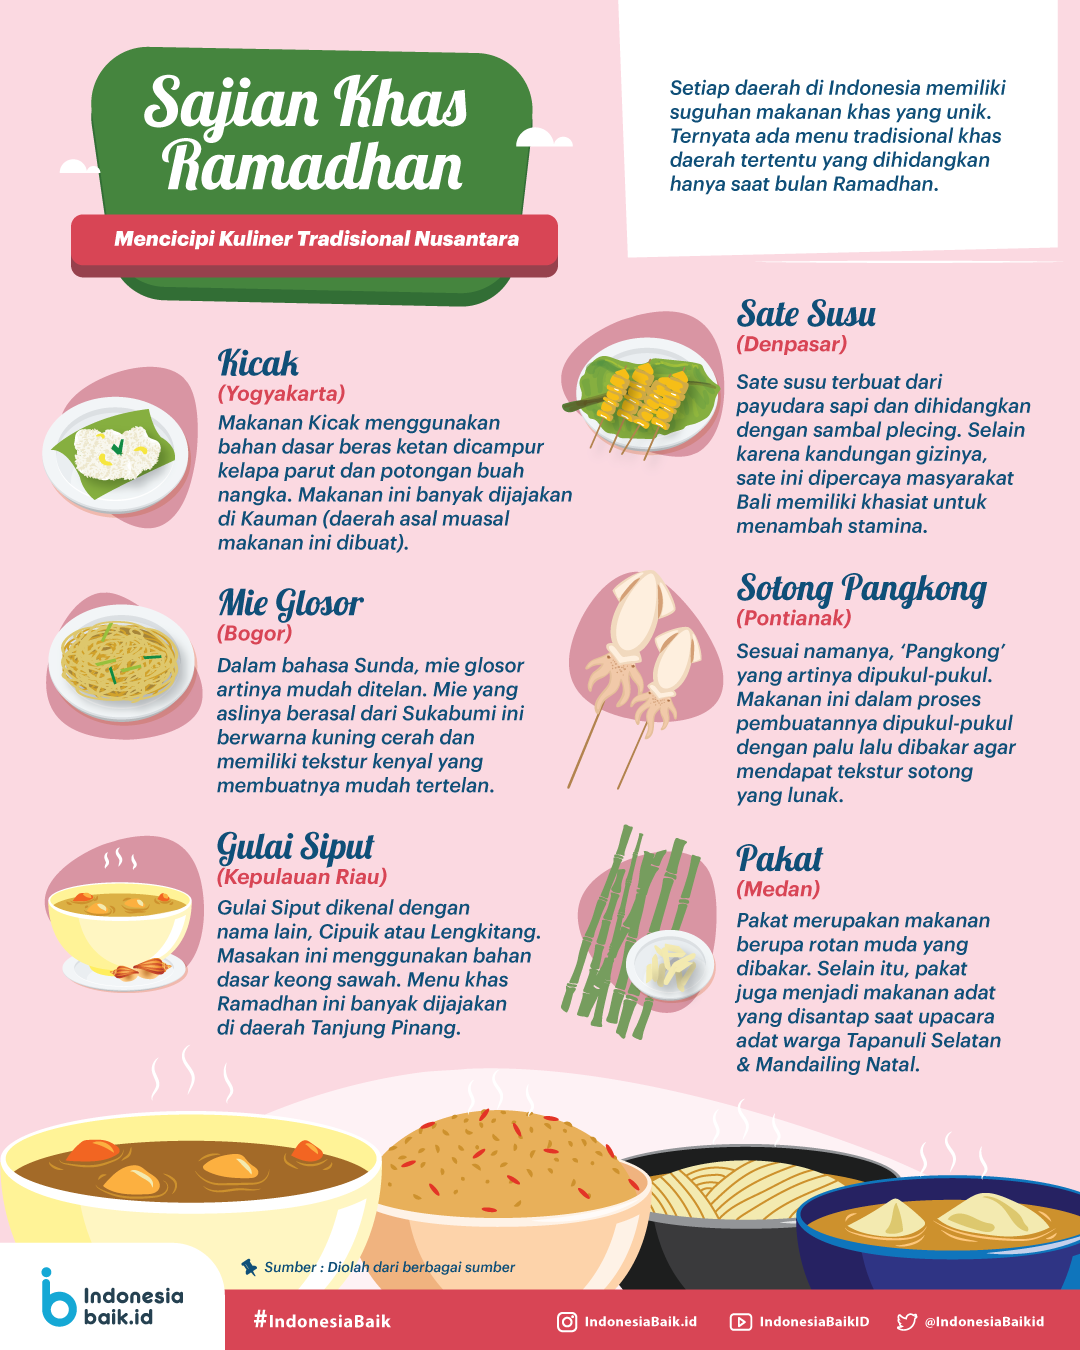 Makanan Khas Saat Ramadhan Indonesia Baik Ide Makanan Makanan Makanan Dan Minuman